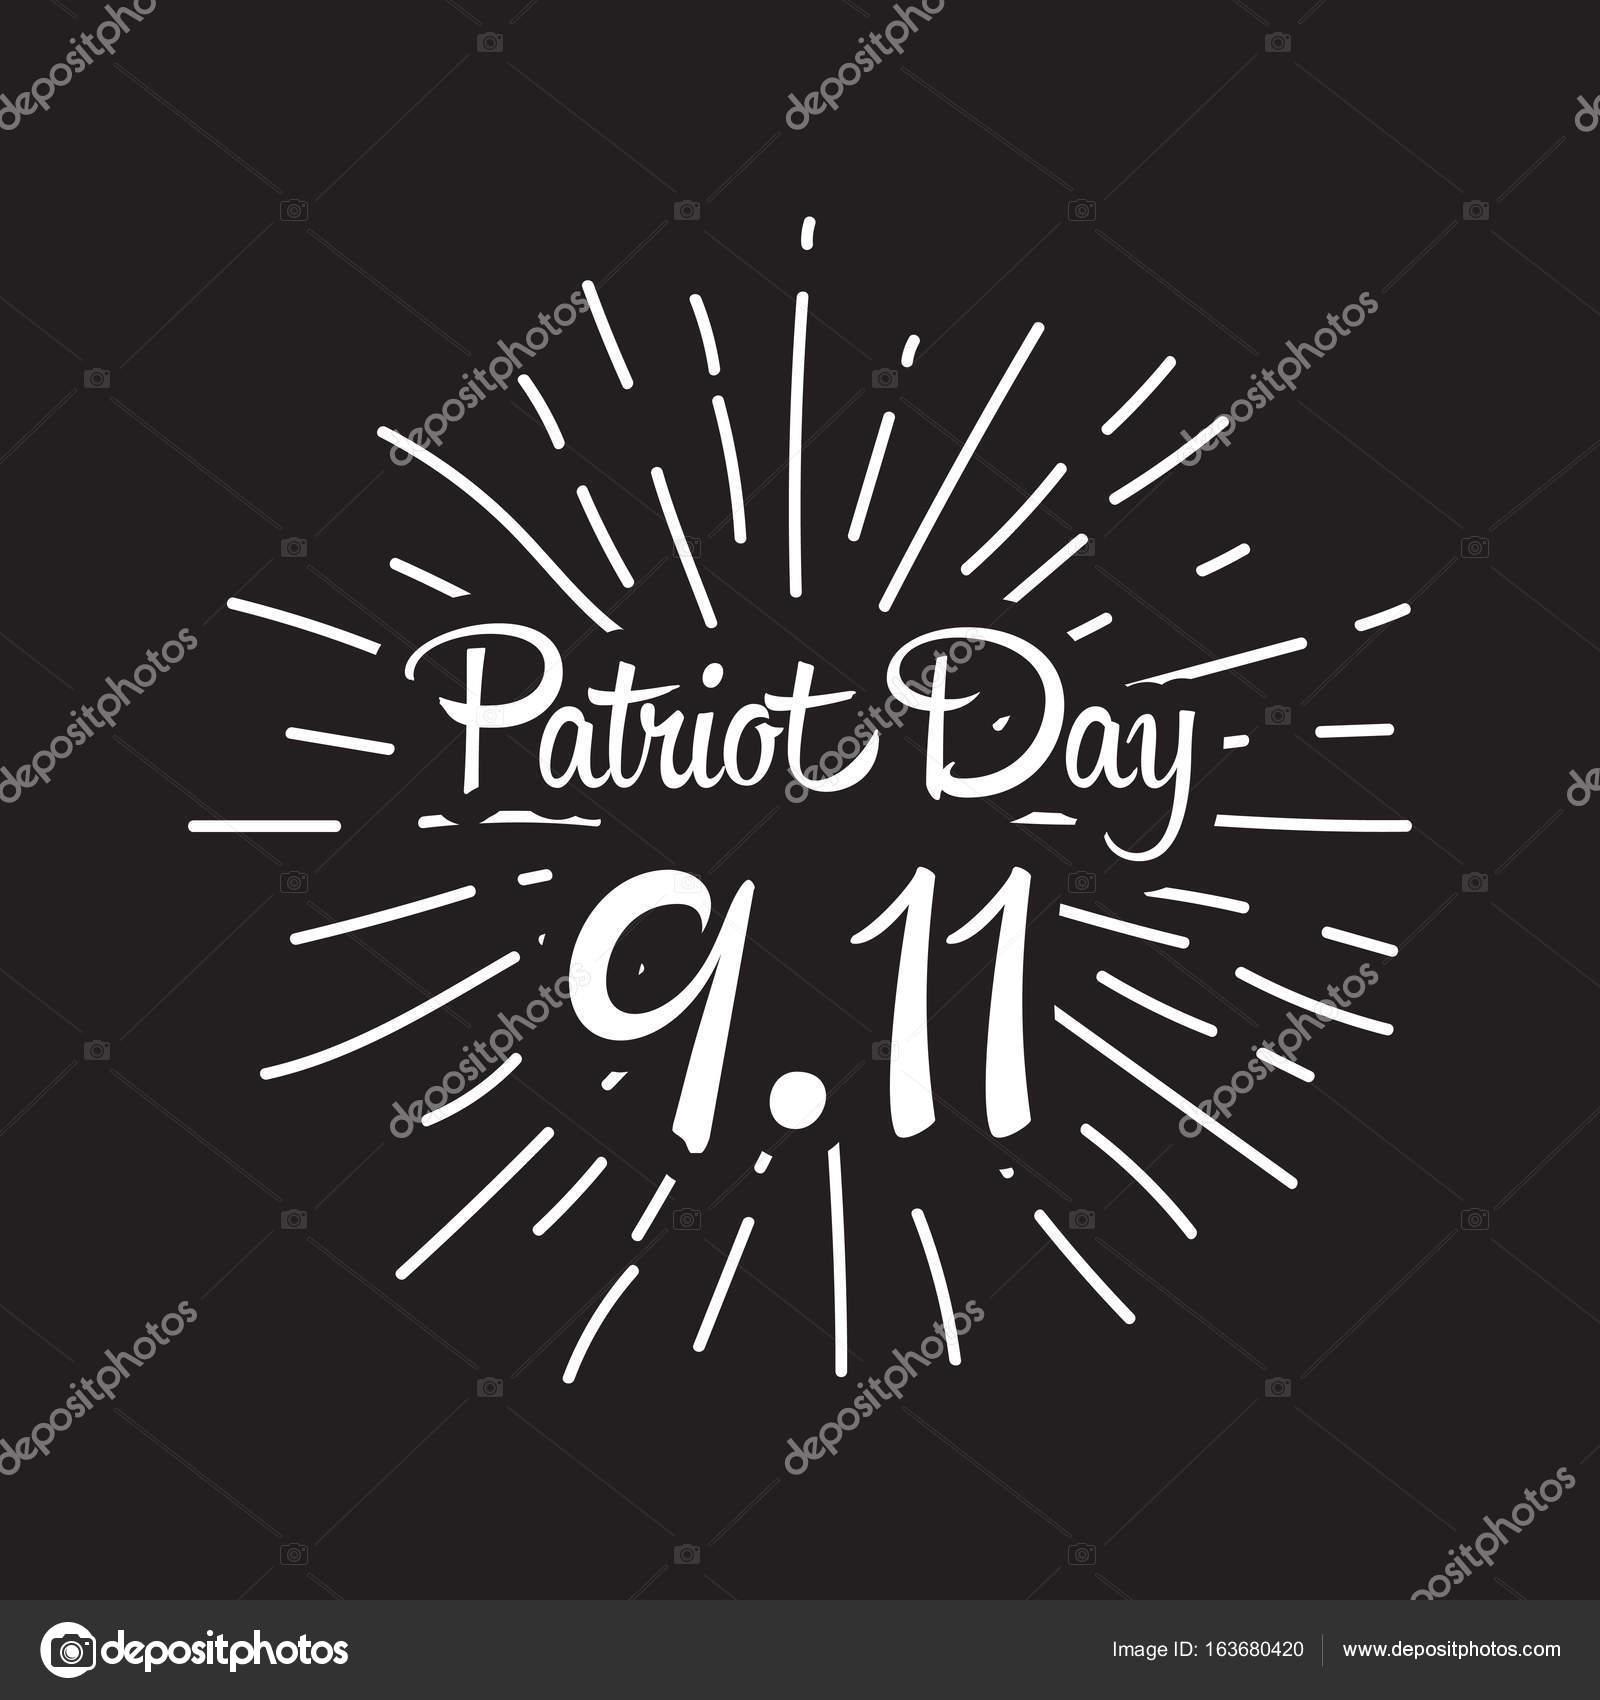 Patriot day, simple memorial design vector illustration 11 september ...